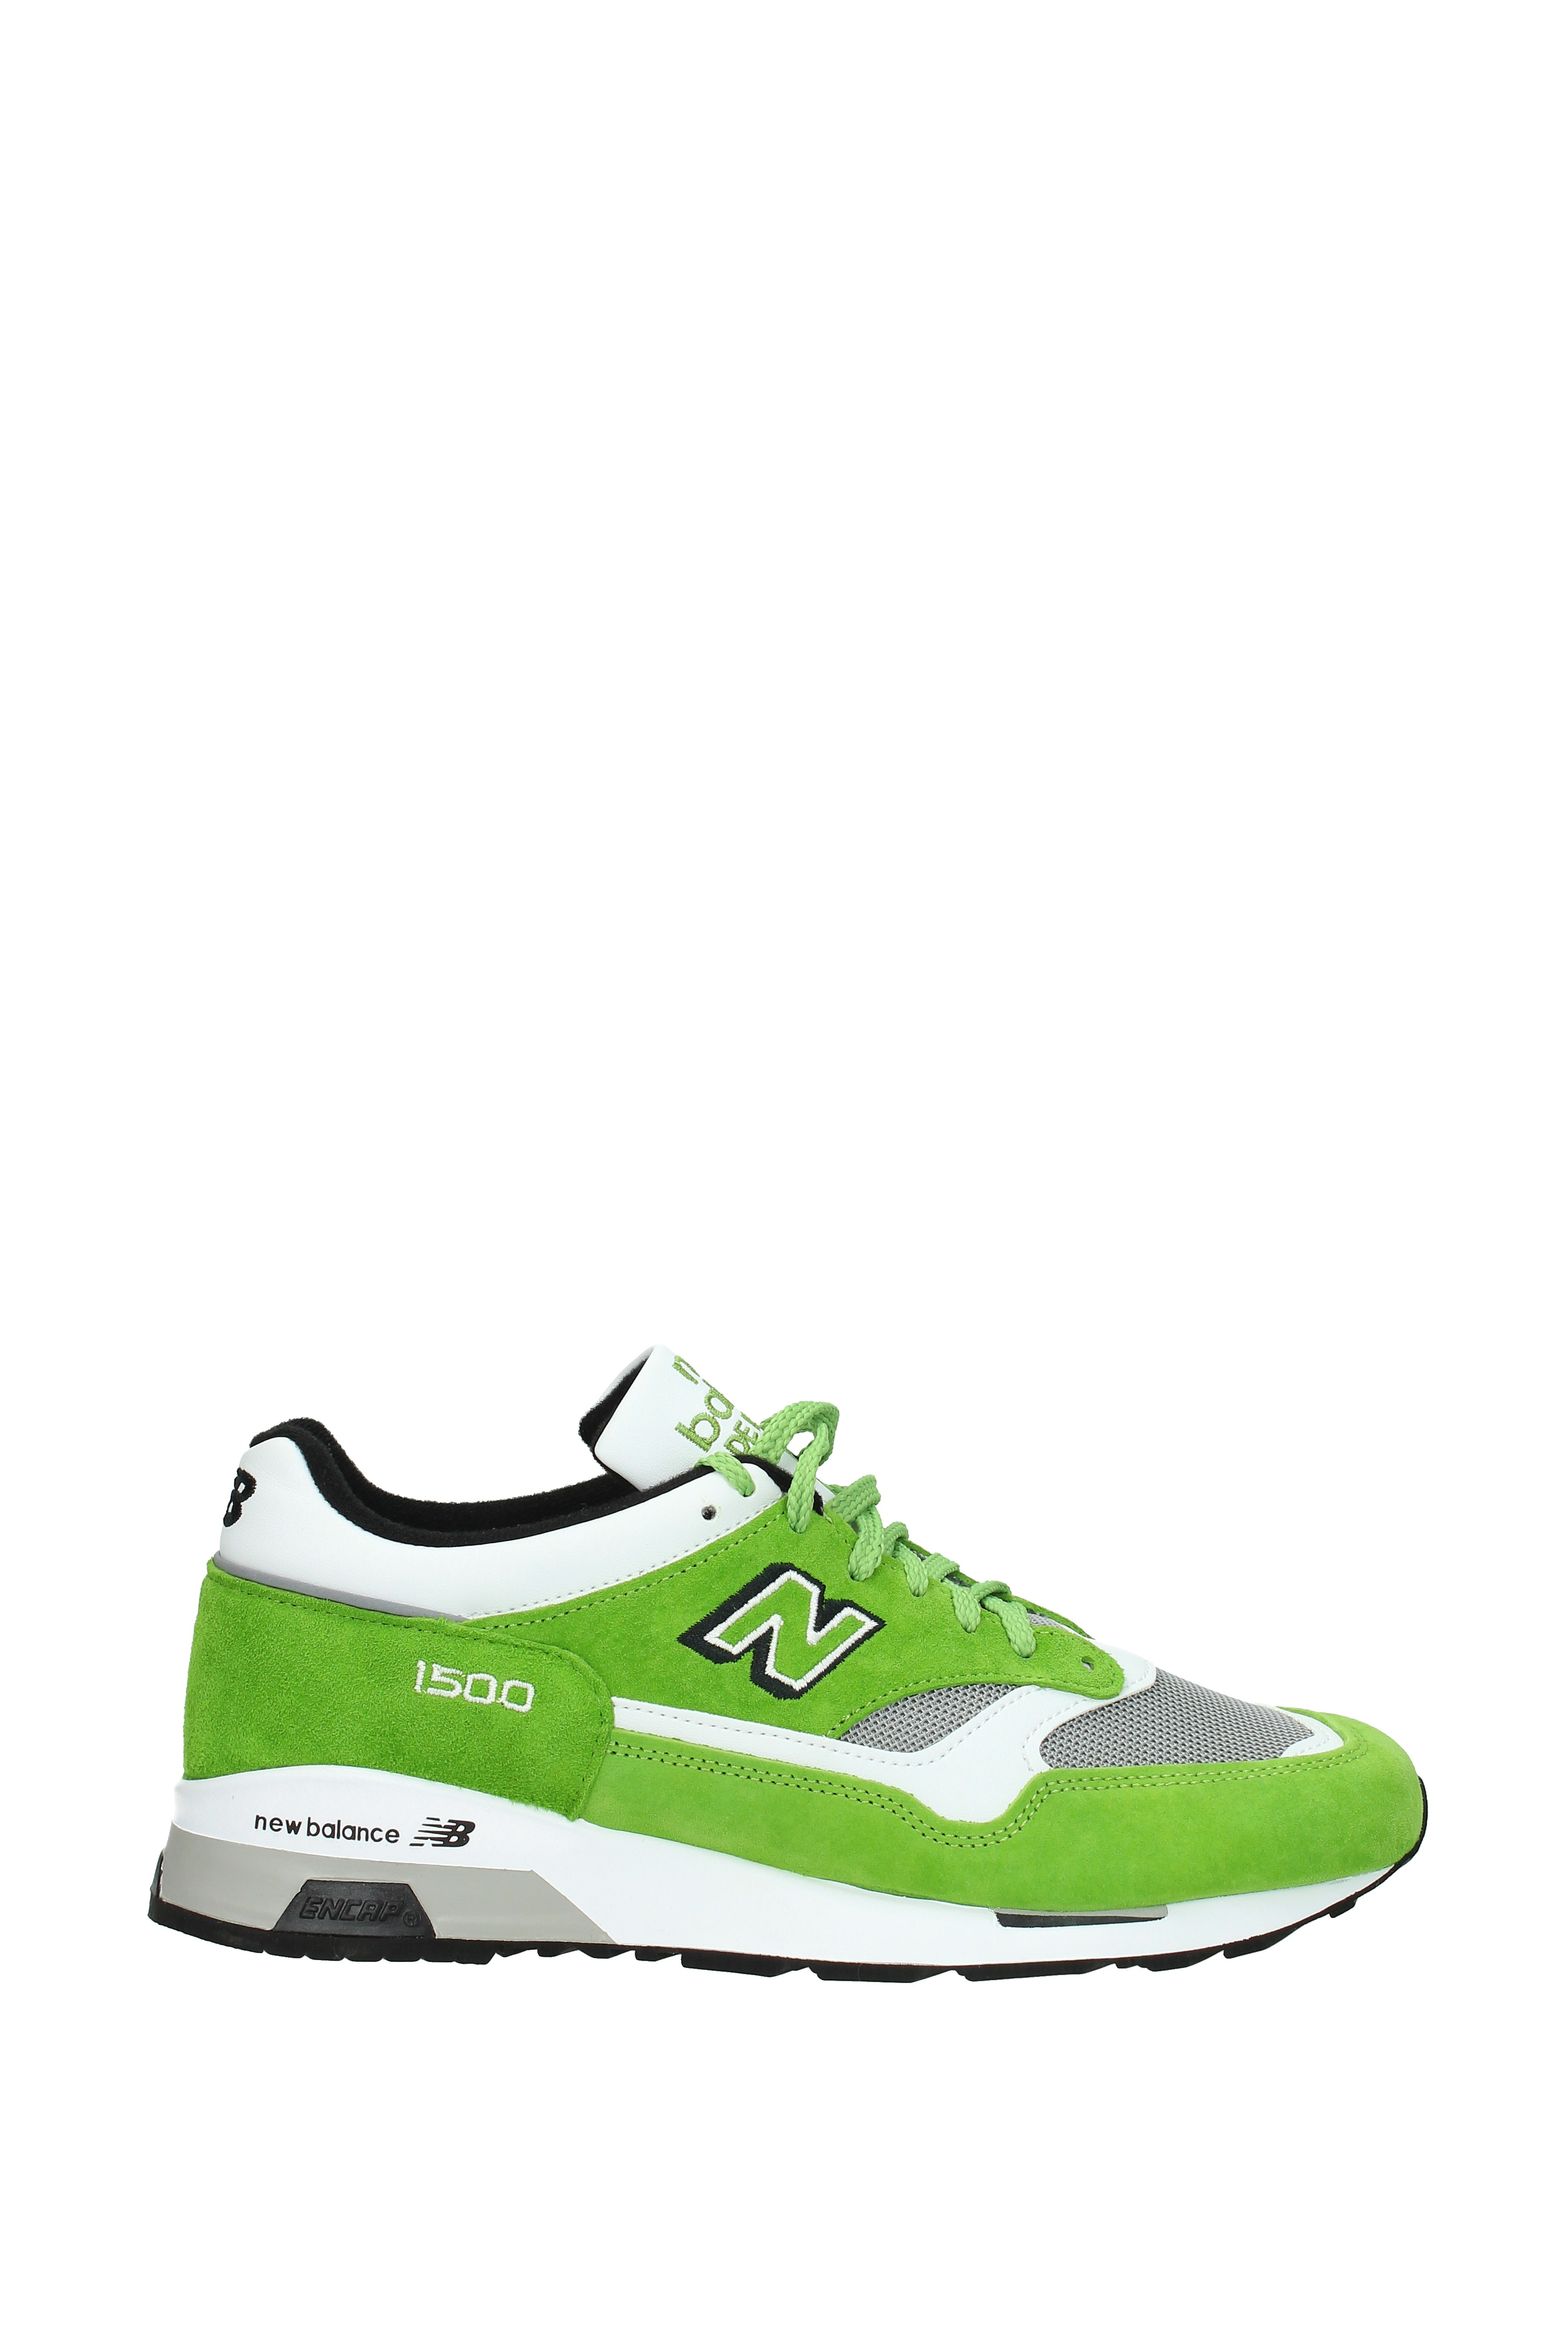 separation shoes d6691 8f571 ... New Nike Jordan Retro 5 3LAB5 Size 9.5 9.5 9.5 ae8b2c ...